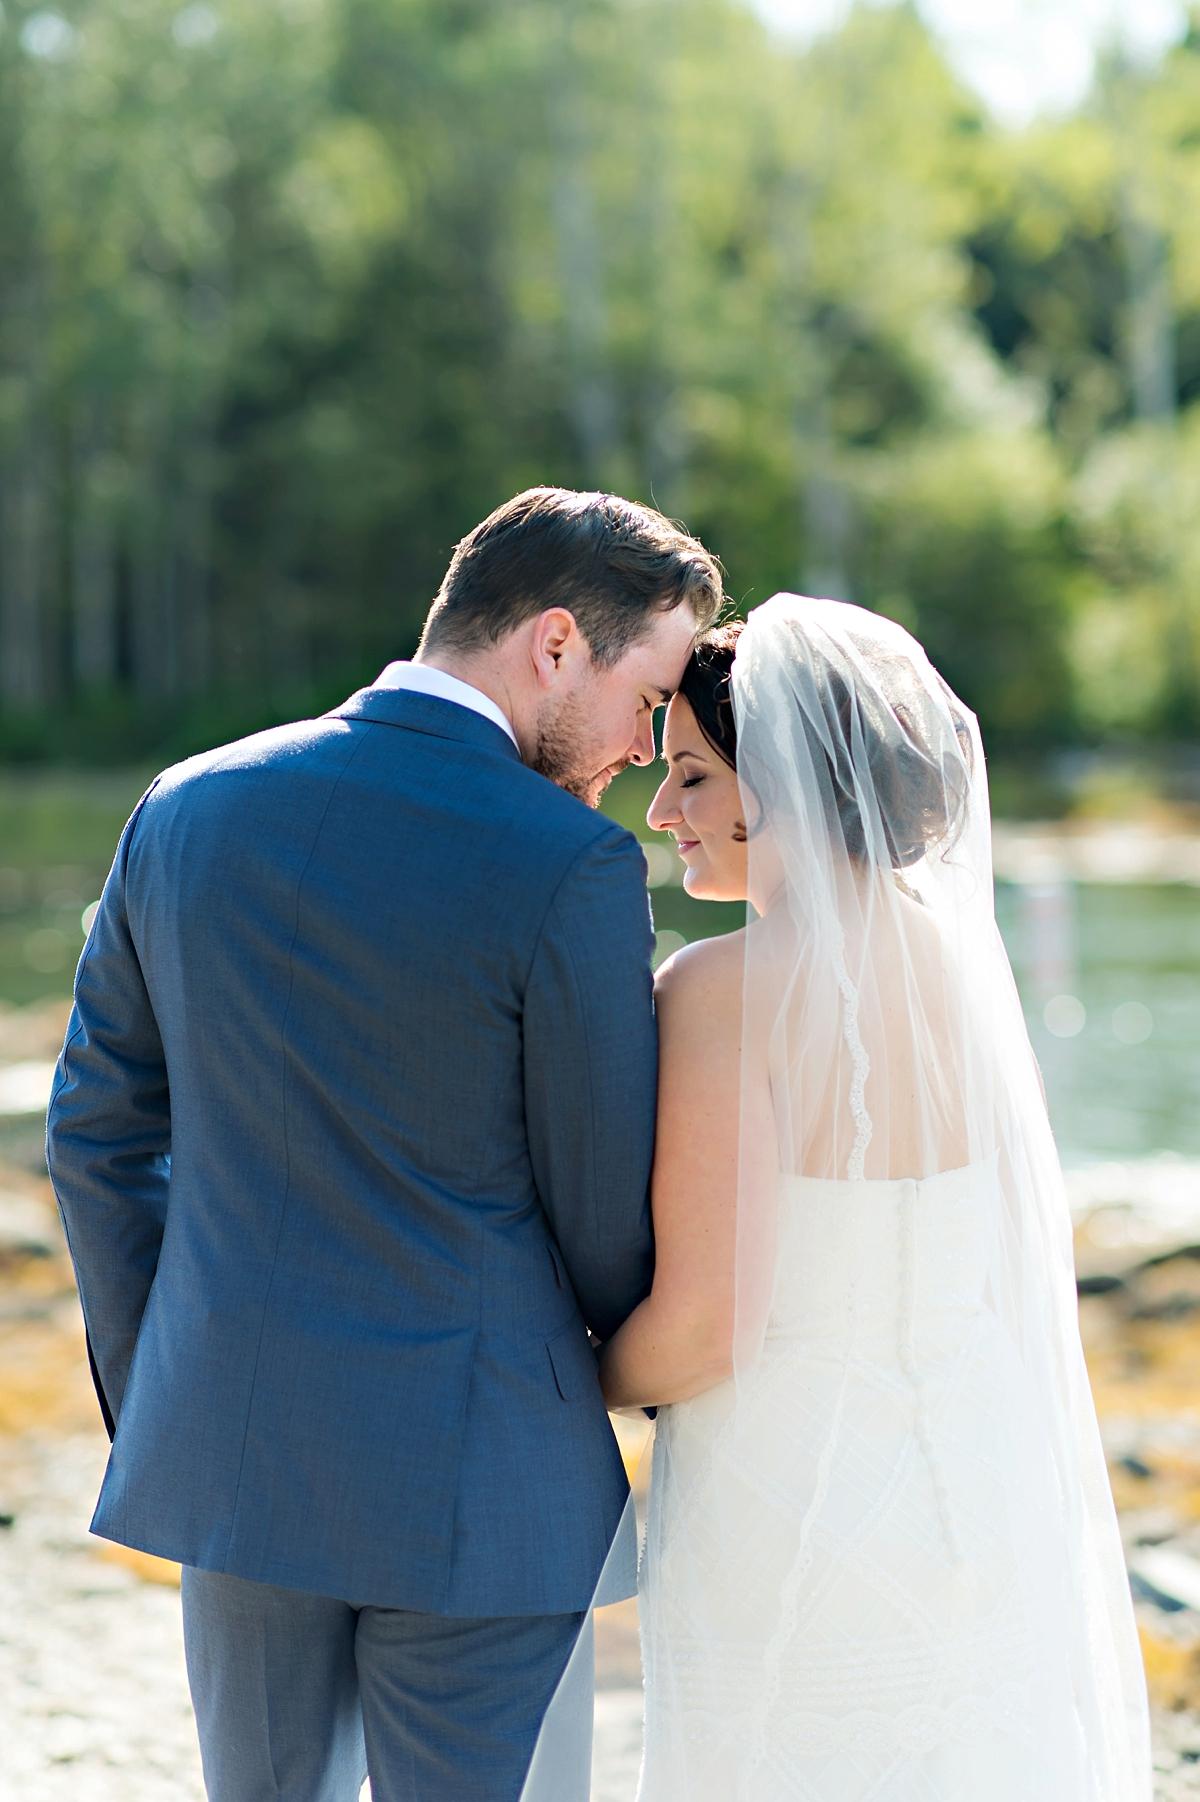 Julie & Taylor's Chester Captains House Wedding, Nova Scotia Wedding Photography050